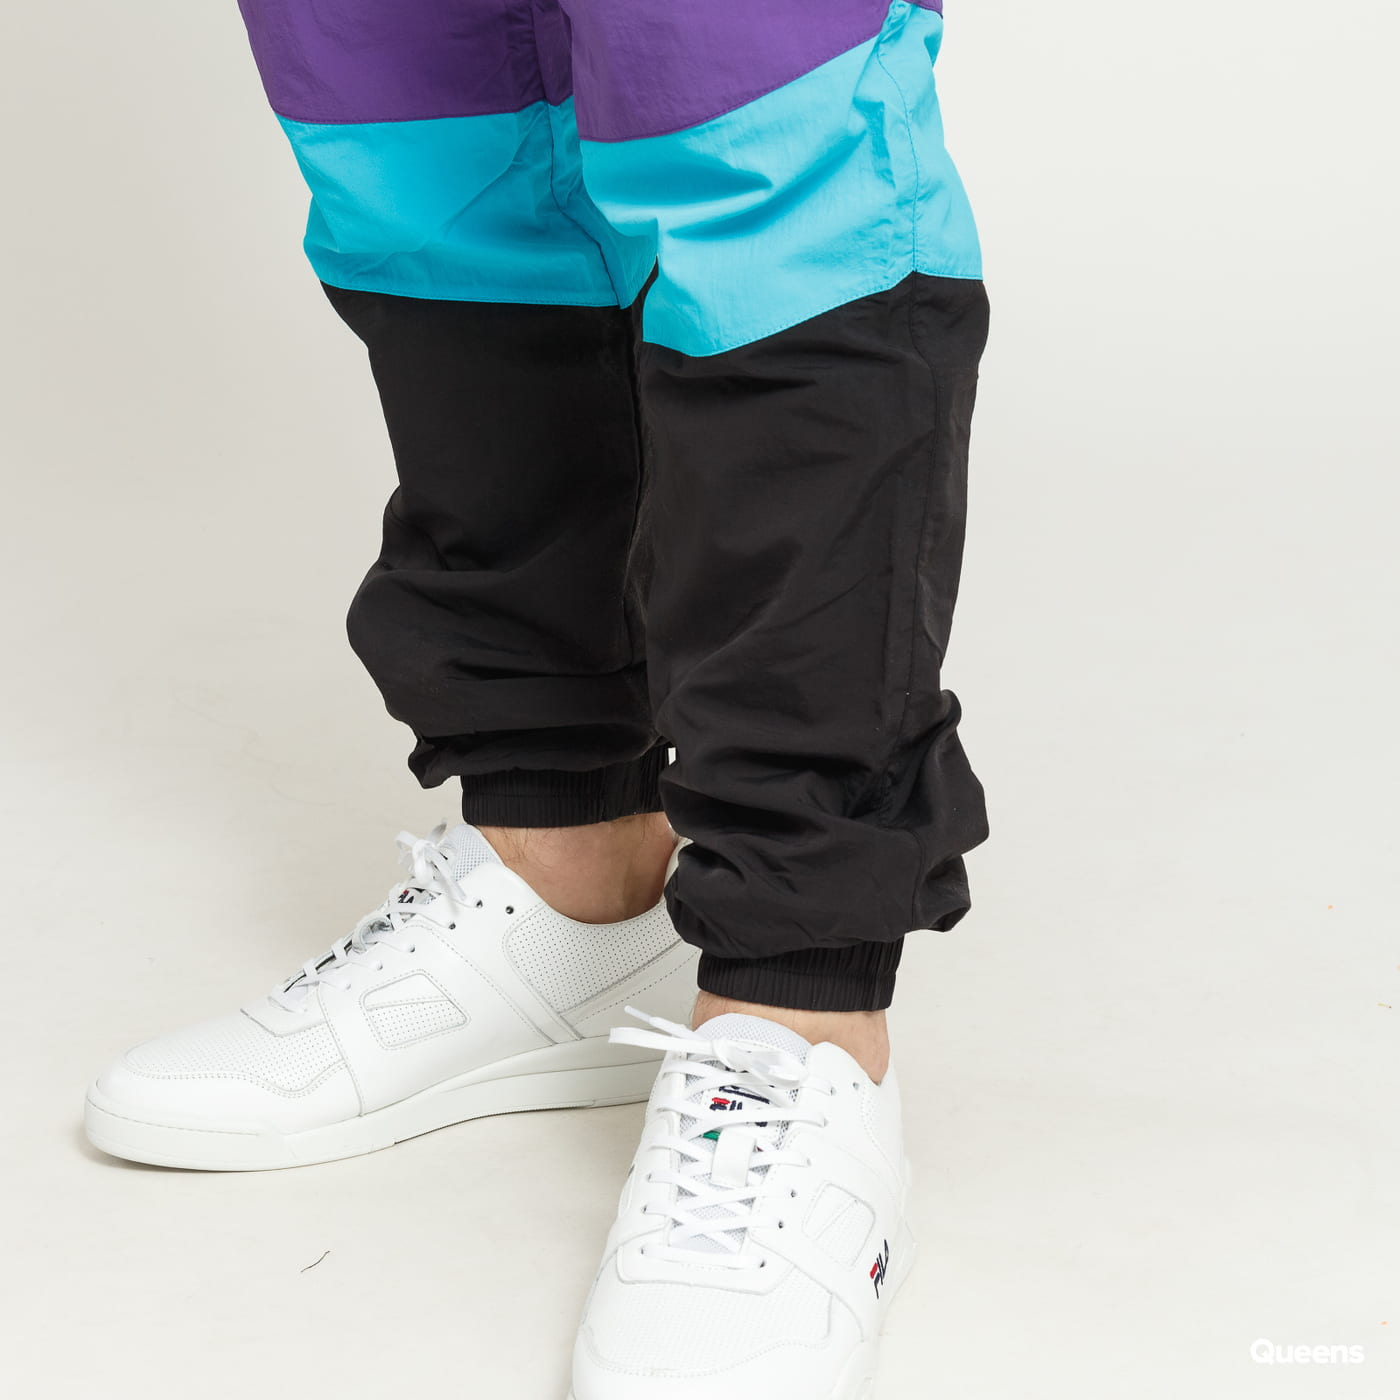 Urban Classics 3-Tone Crinkle Track Pants schwarz / lila / blau